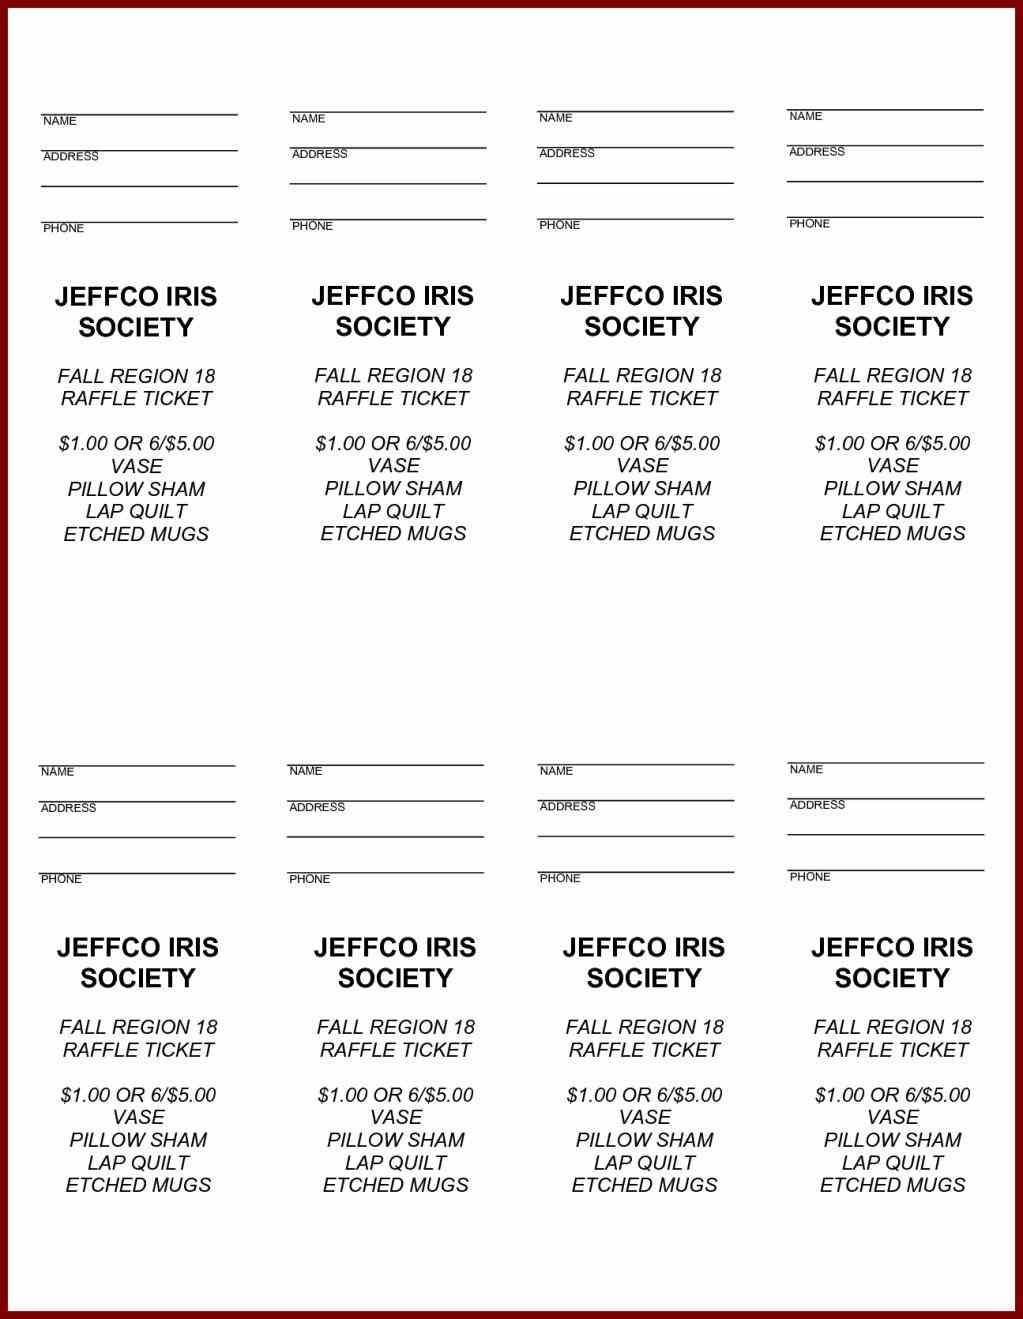 Free Printable Raffle Ticket Template Easytouse Free Raffle Ticket - Free Printable Tickets